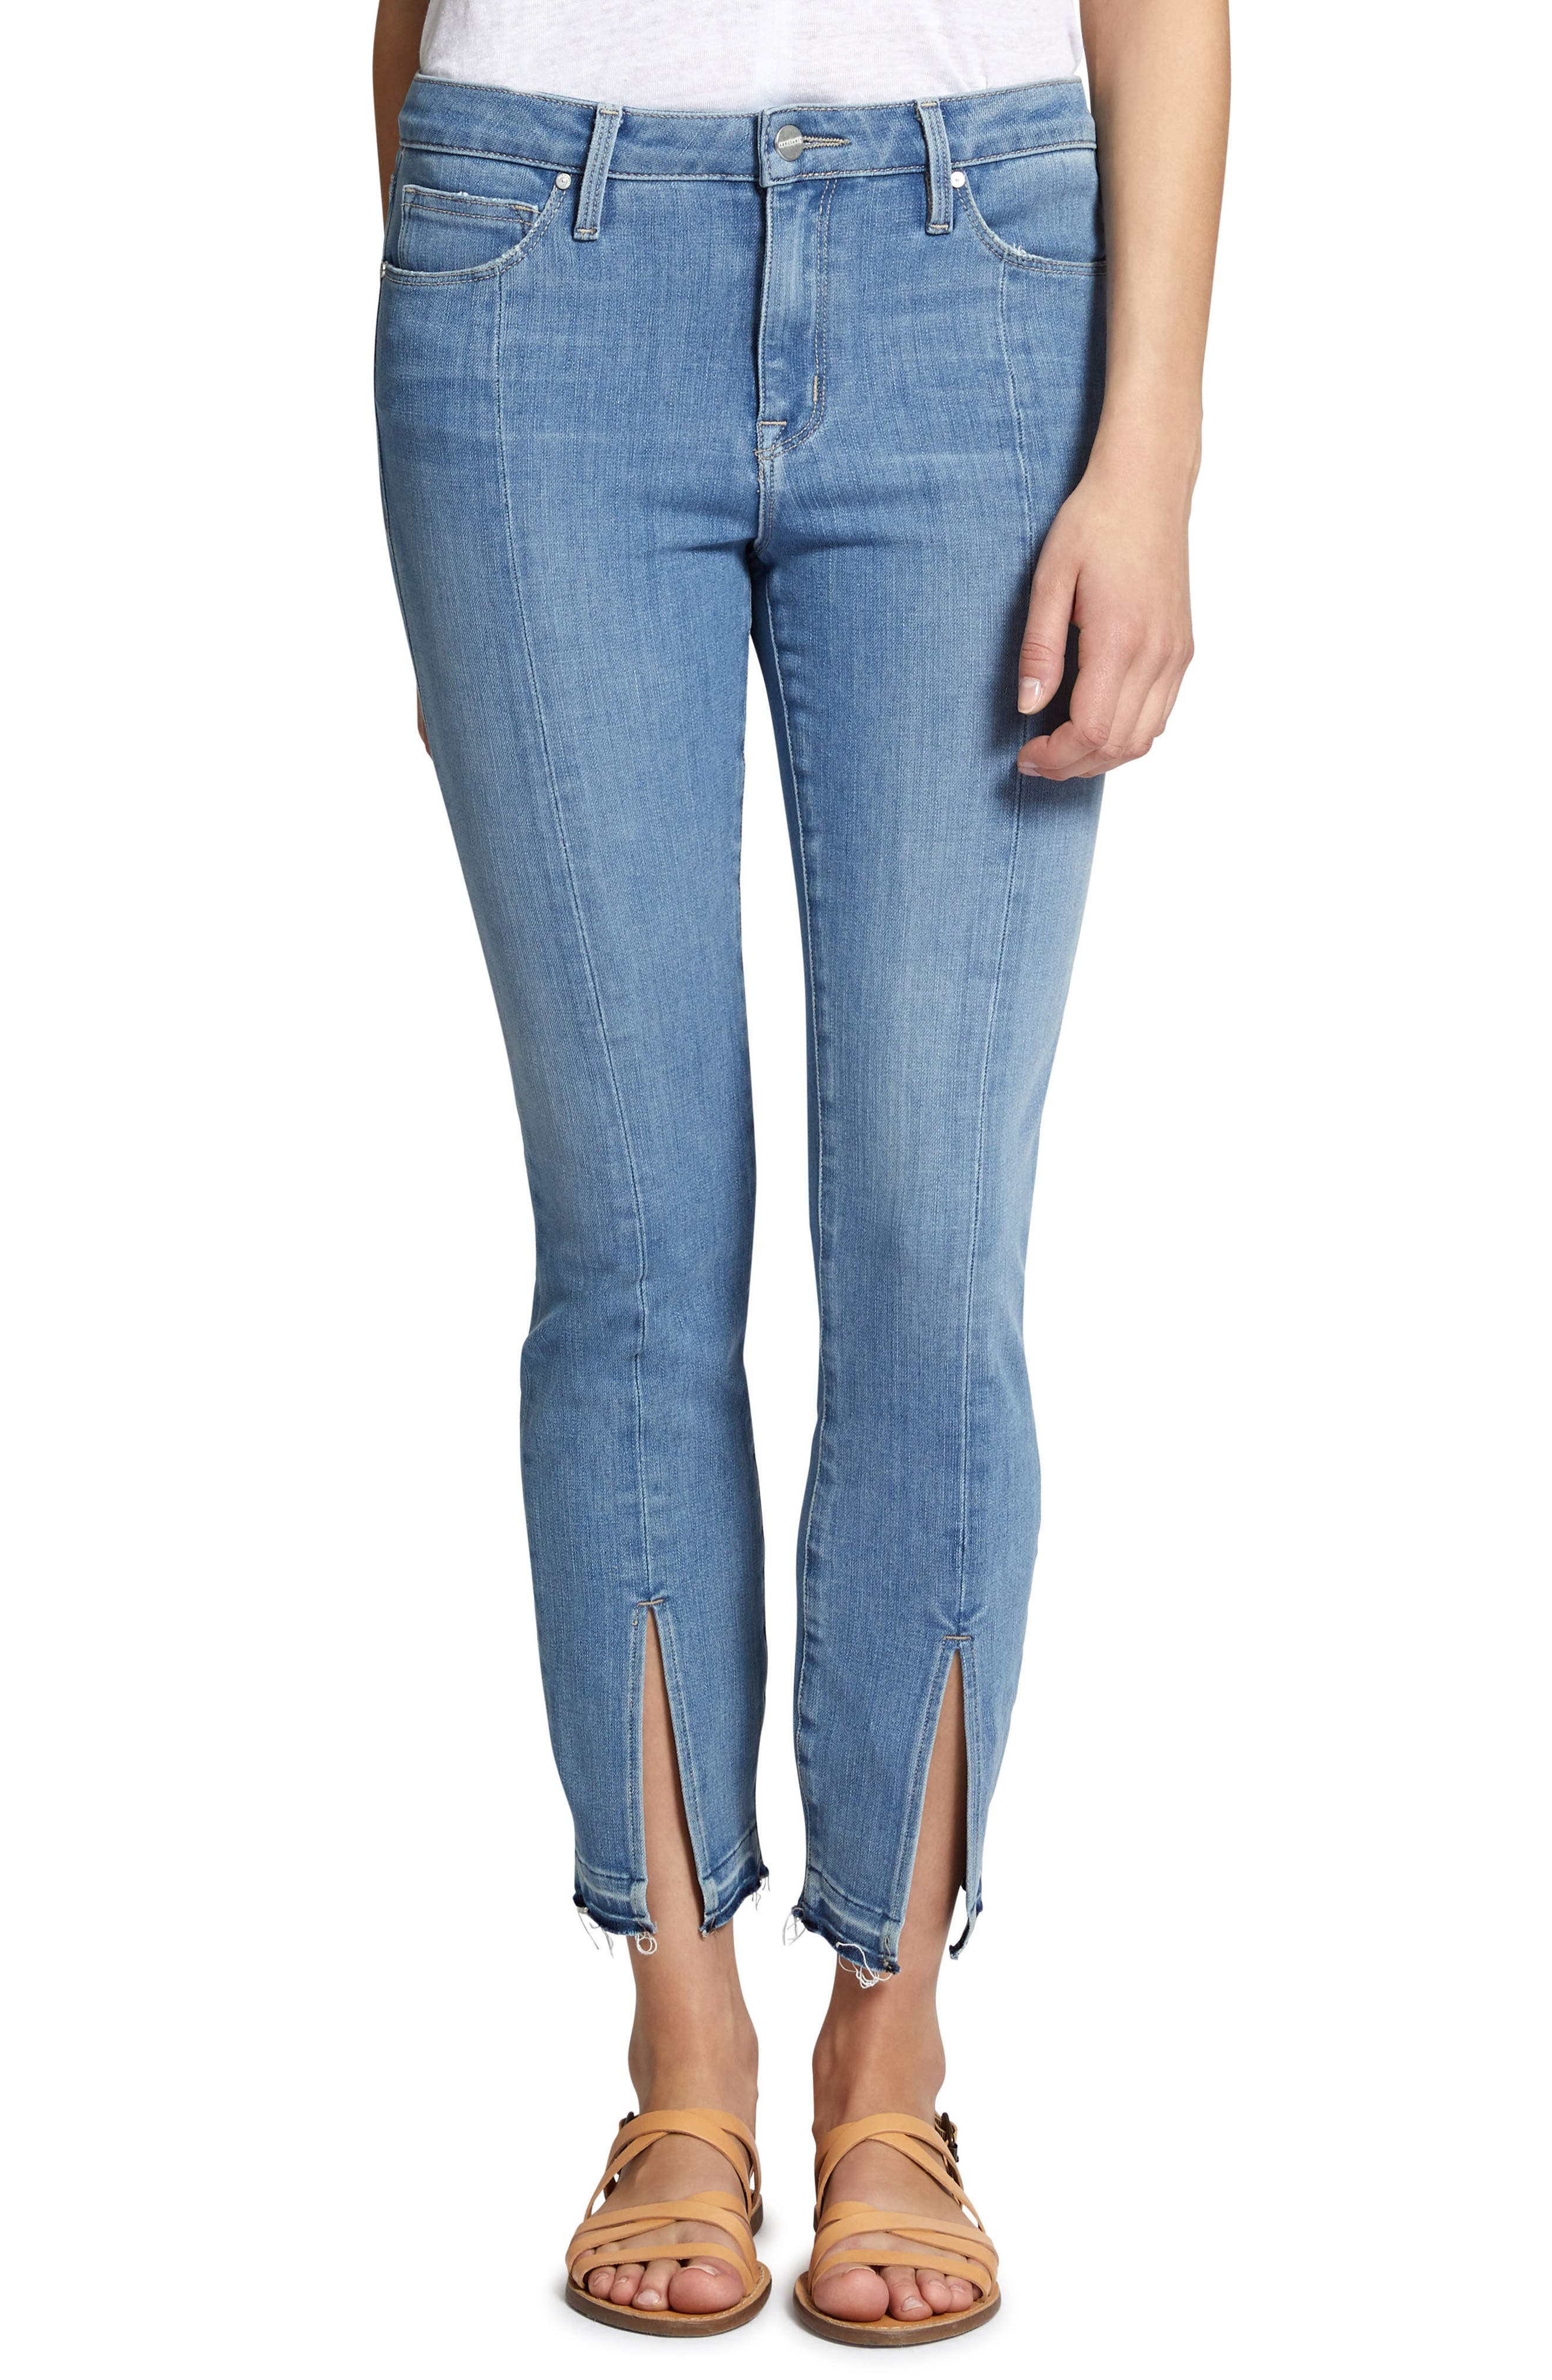 Robbie Spring Slit Jeans,                             Main thumbnail 1, color,                             421